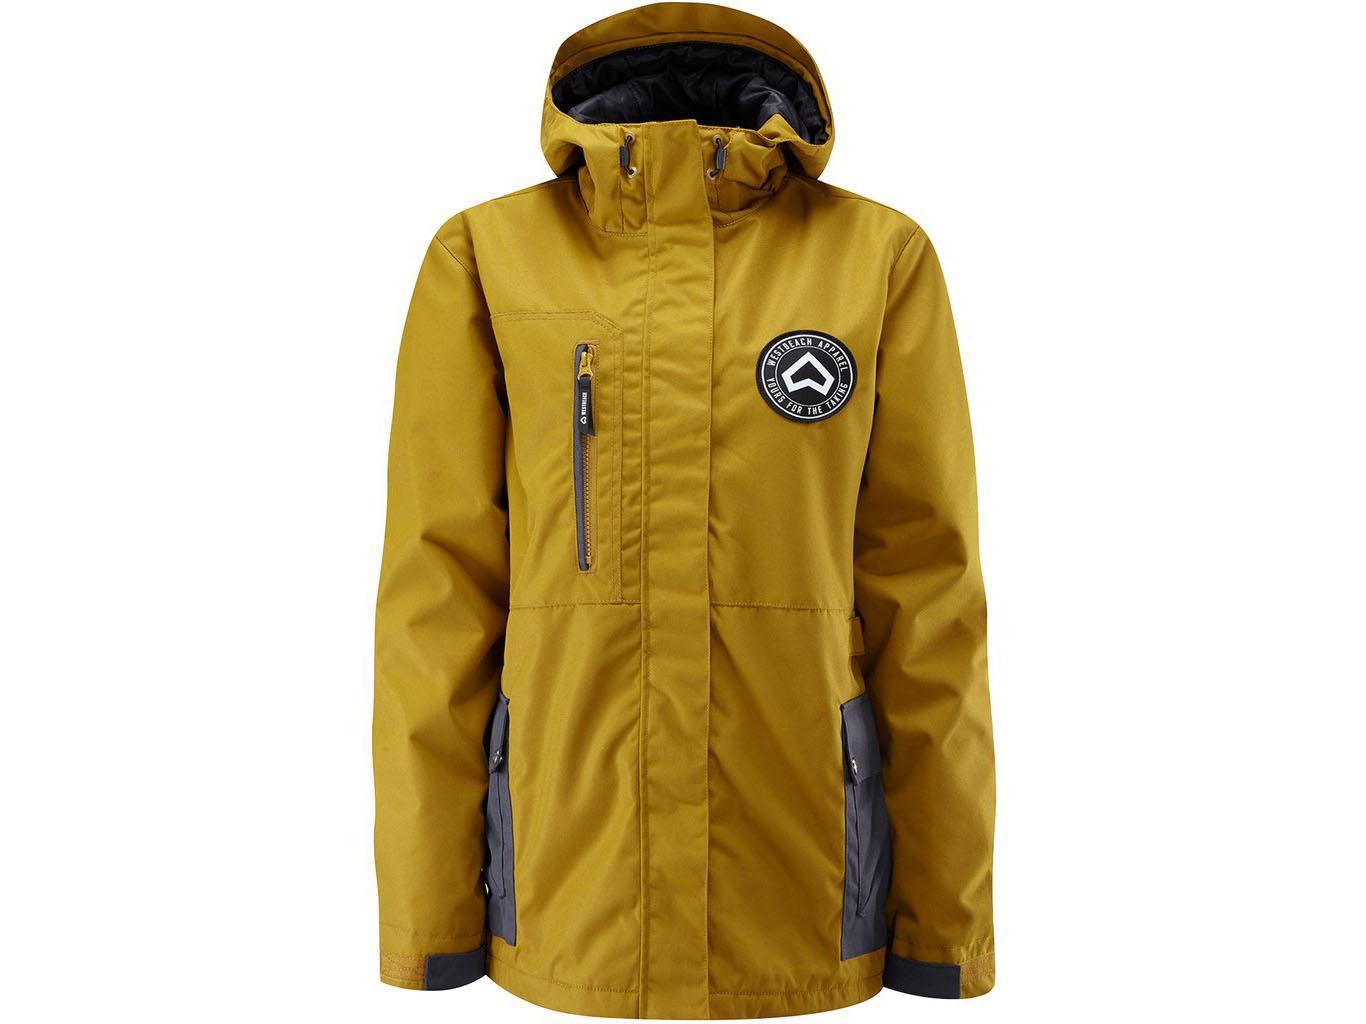 da5f279f816 12 best women's ski and snowboard jackets | The Independent